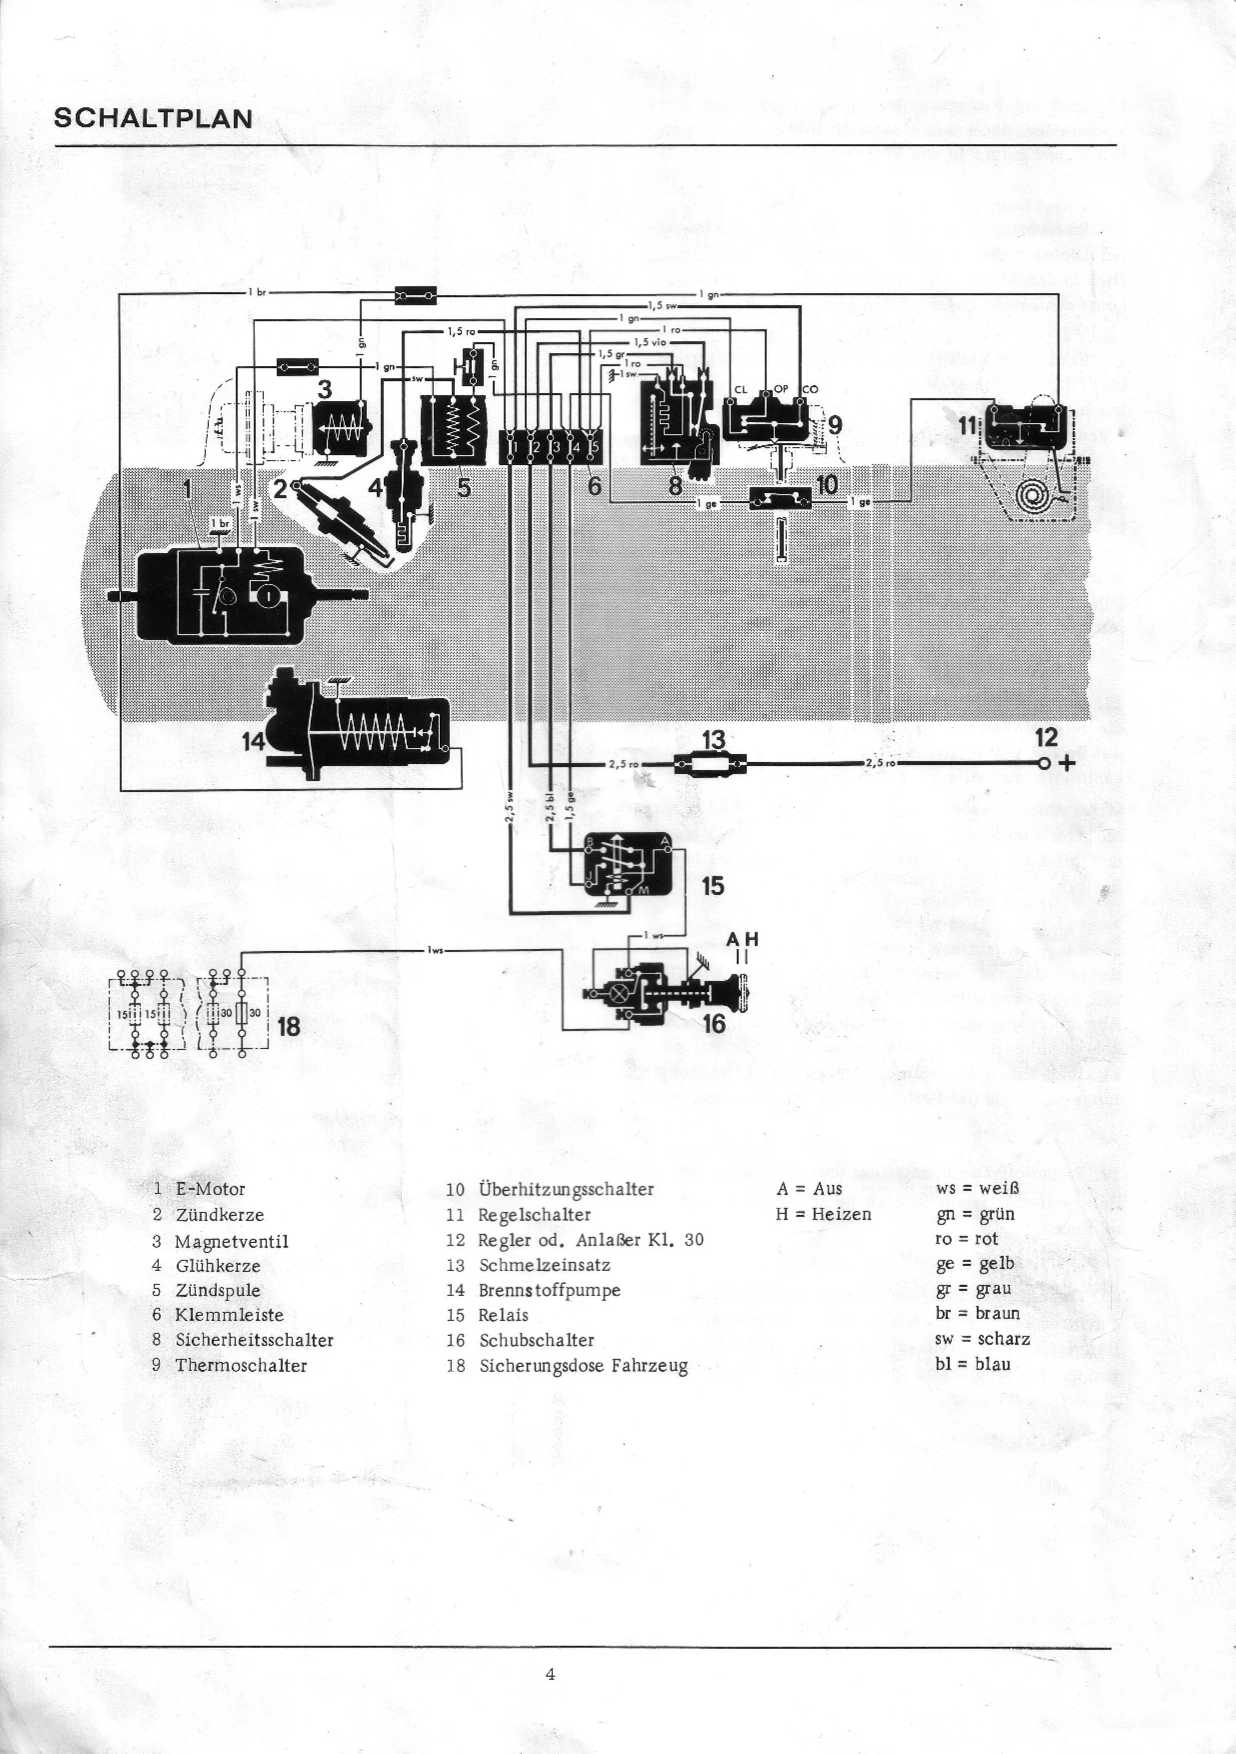 1970 10 eberspaecher bn4 wiring diagram?resize\\\\\\\=665%2C944 1927 buick wiring diagram wiring diagrams 2010 Buick Lacrosse Wiring-Diagram at webbmarketing.co